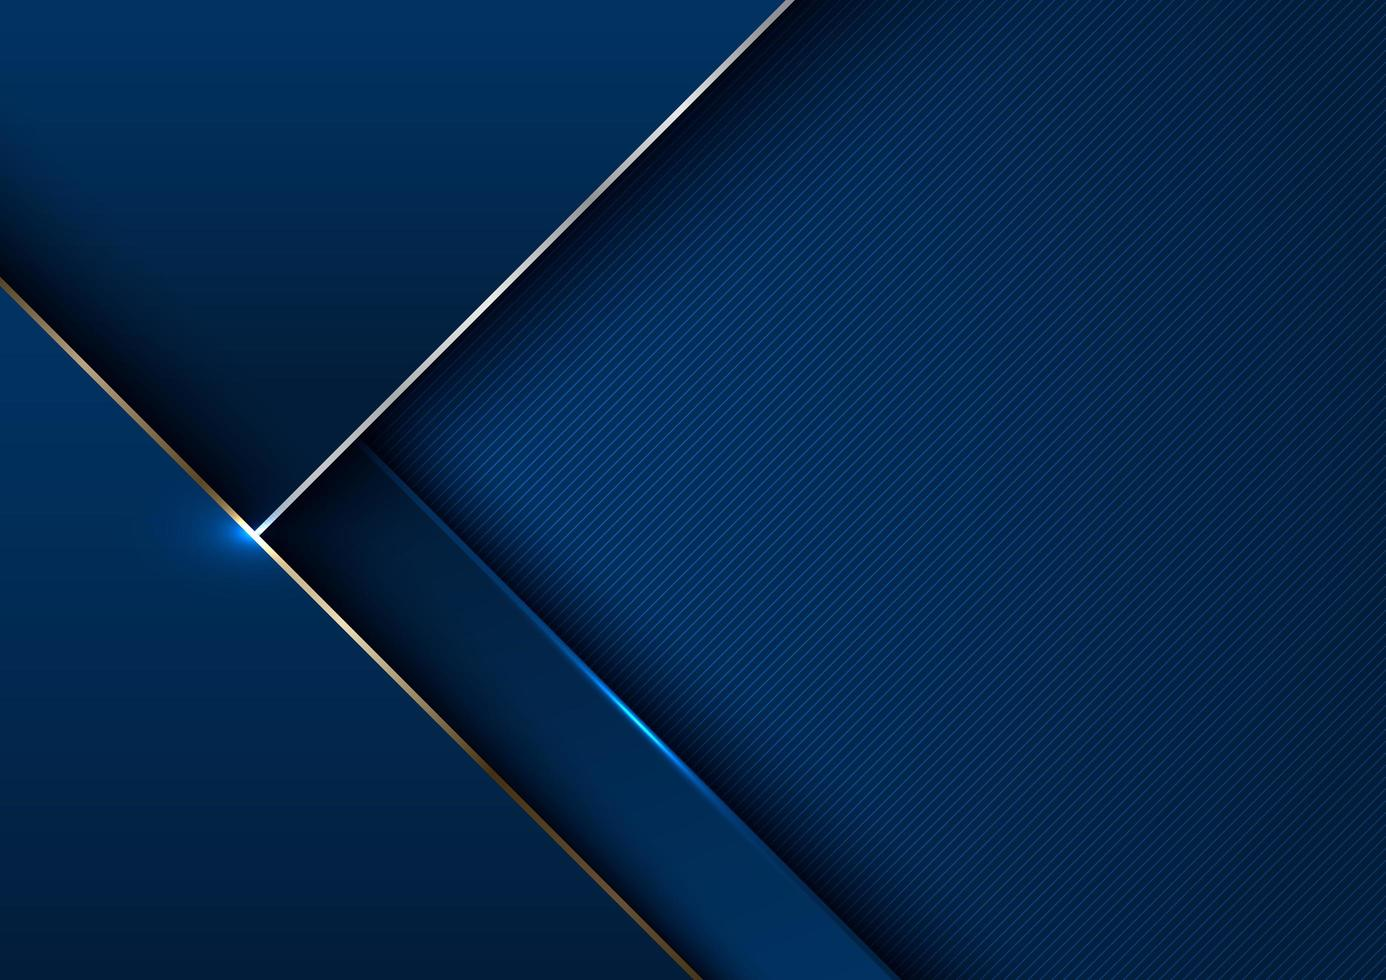 abstrato elegante modelo geométrico azul com ouro metálico vetor